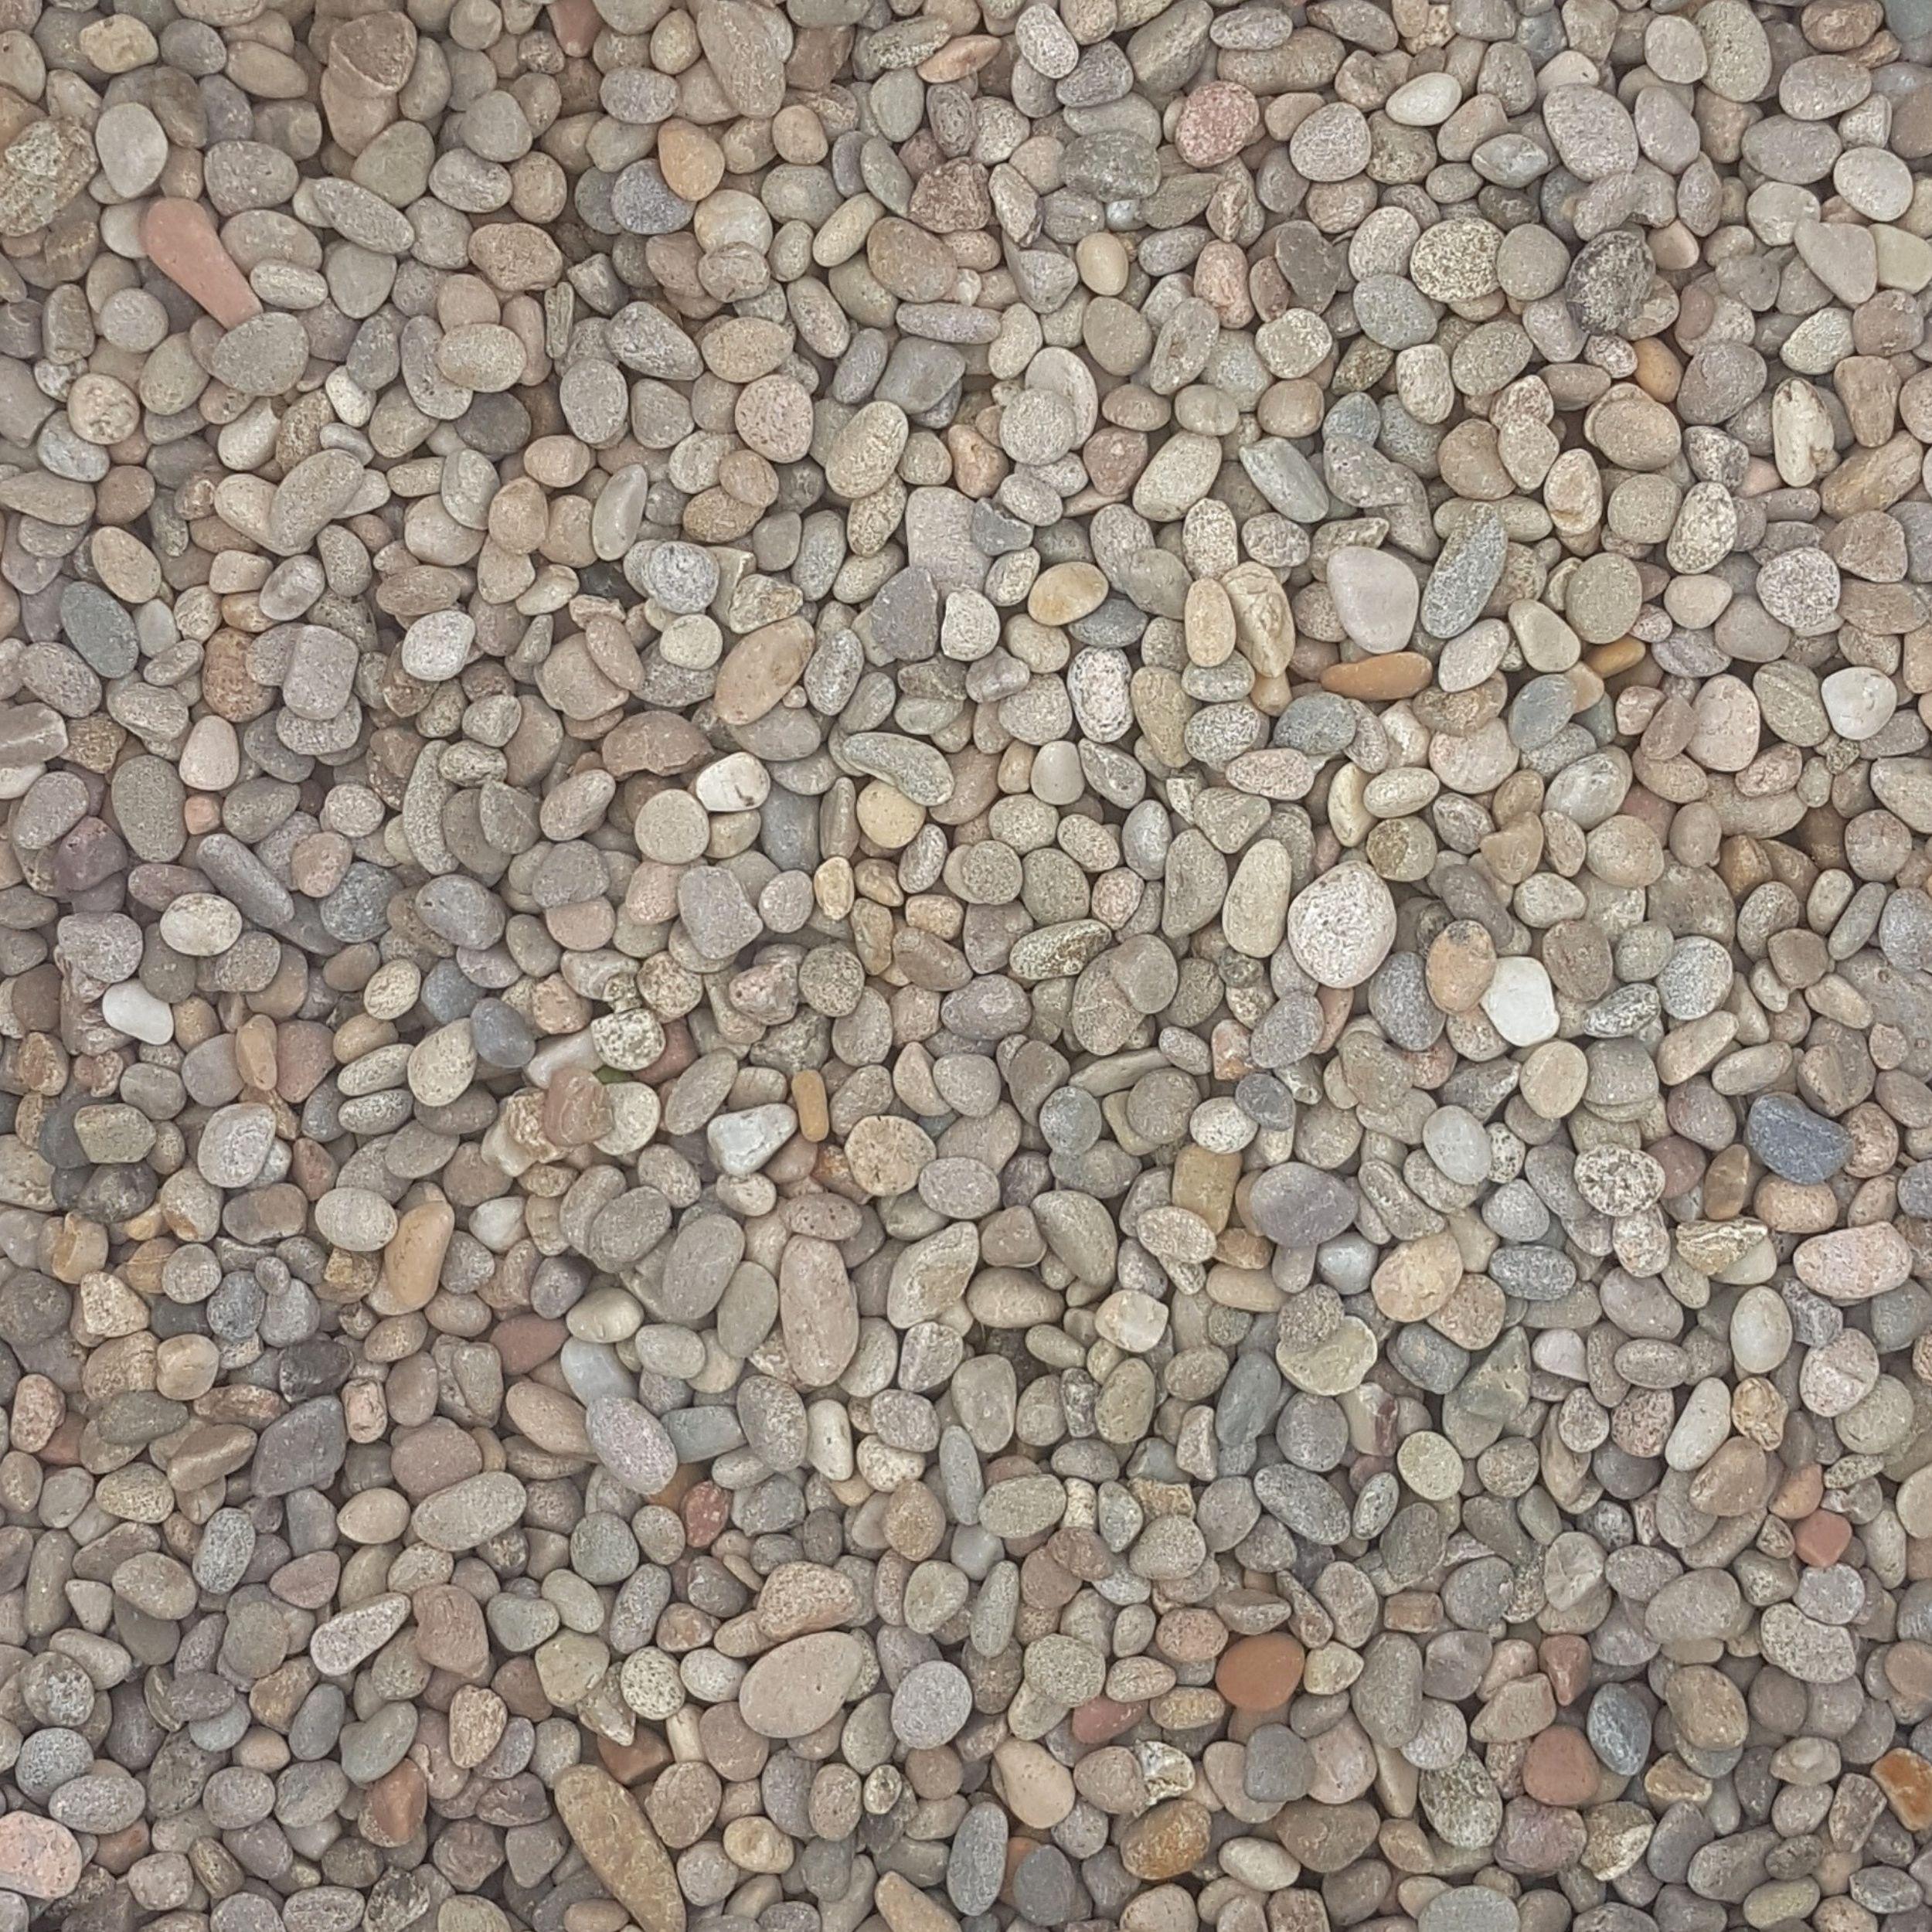 scottish pebble stones 14mm 20mm dry mitchell turf